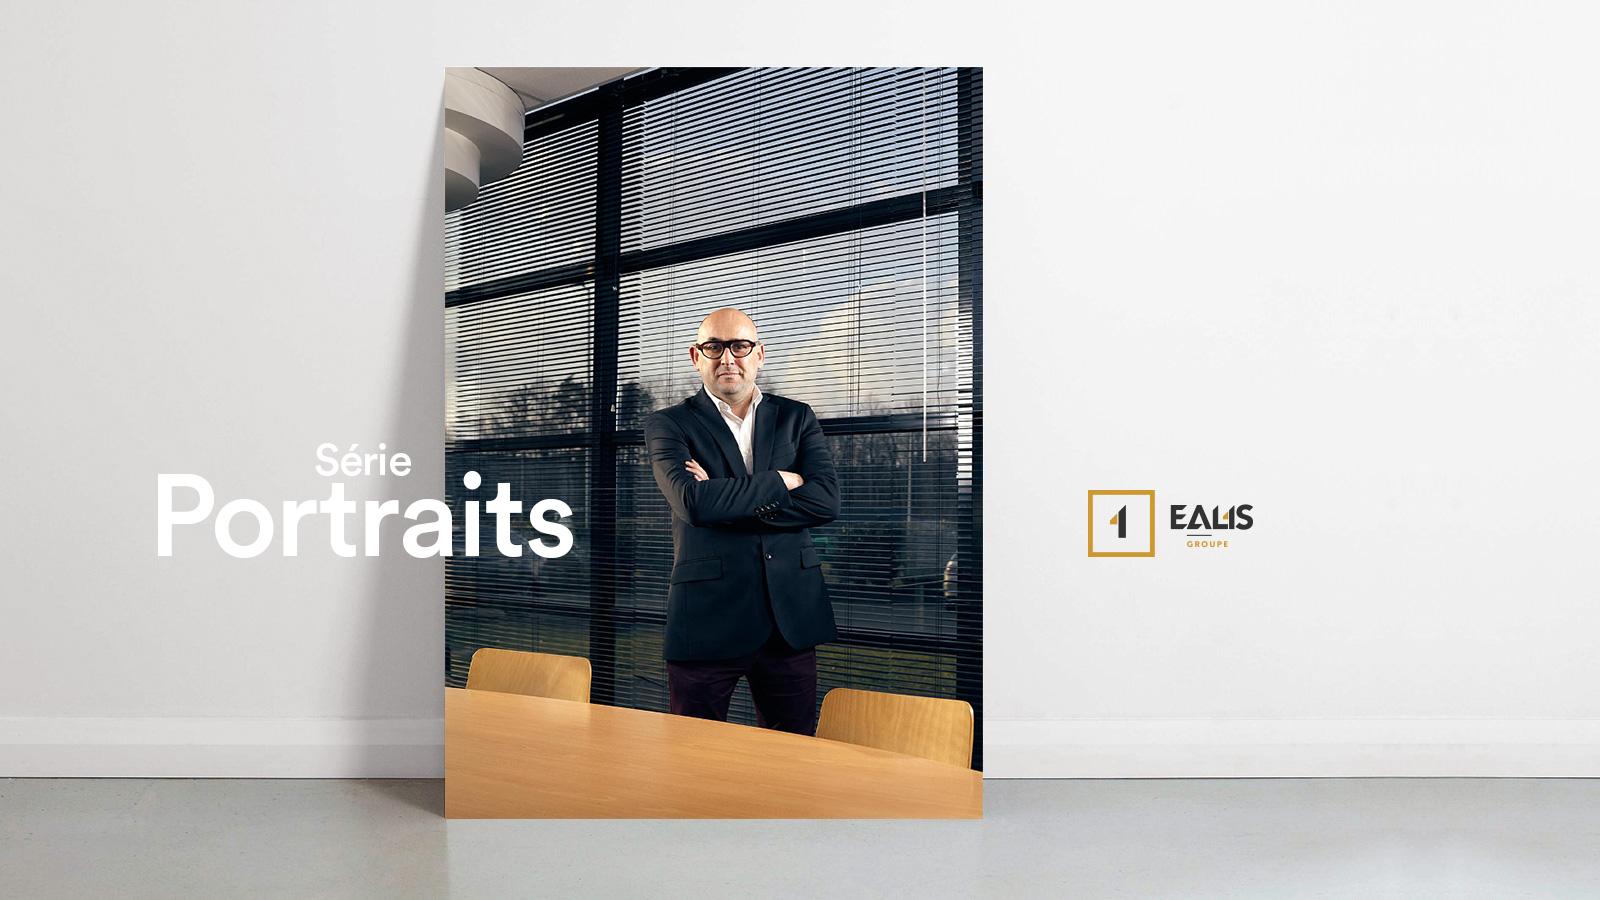 portraits-ealis-groupe-photographie-par-benaedesign-alexandre-bena